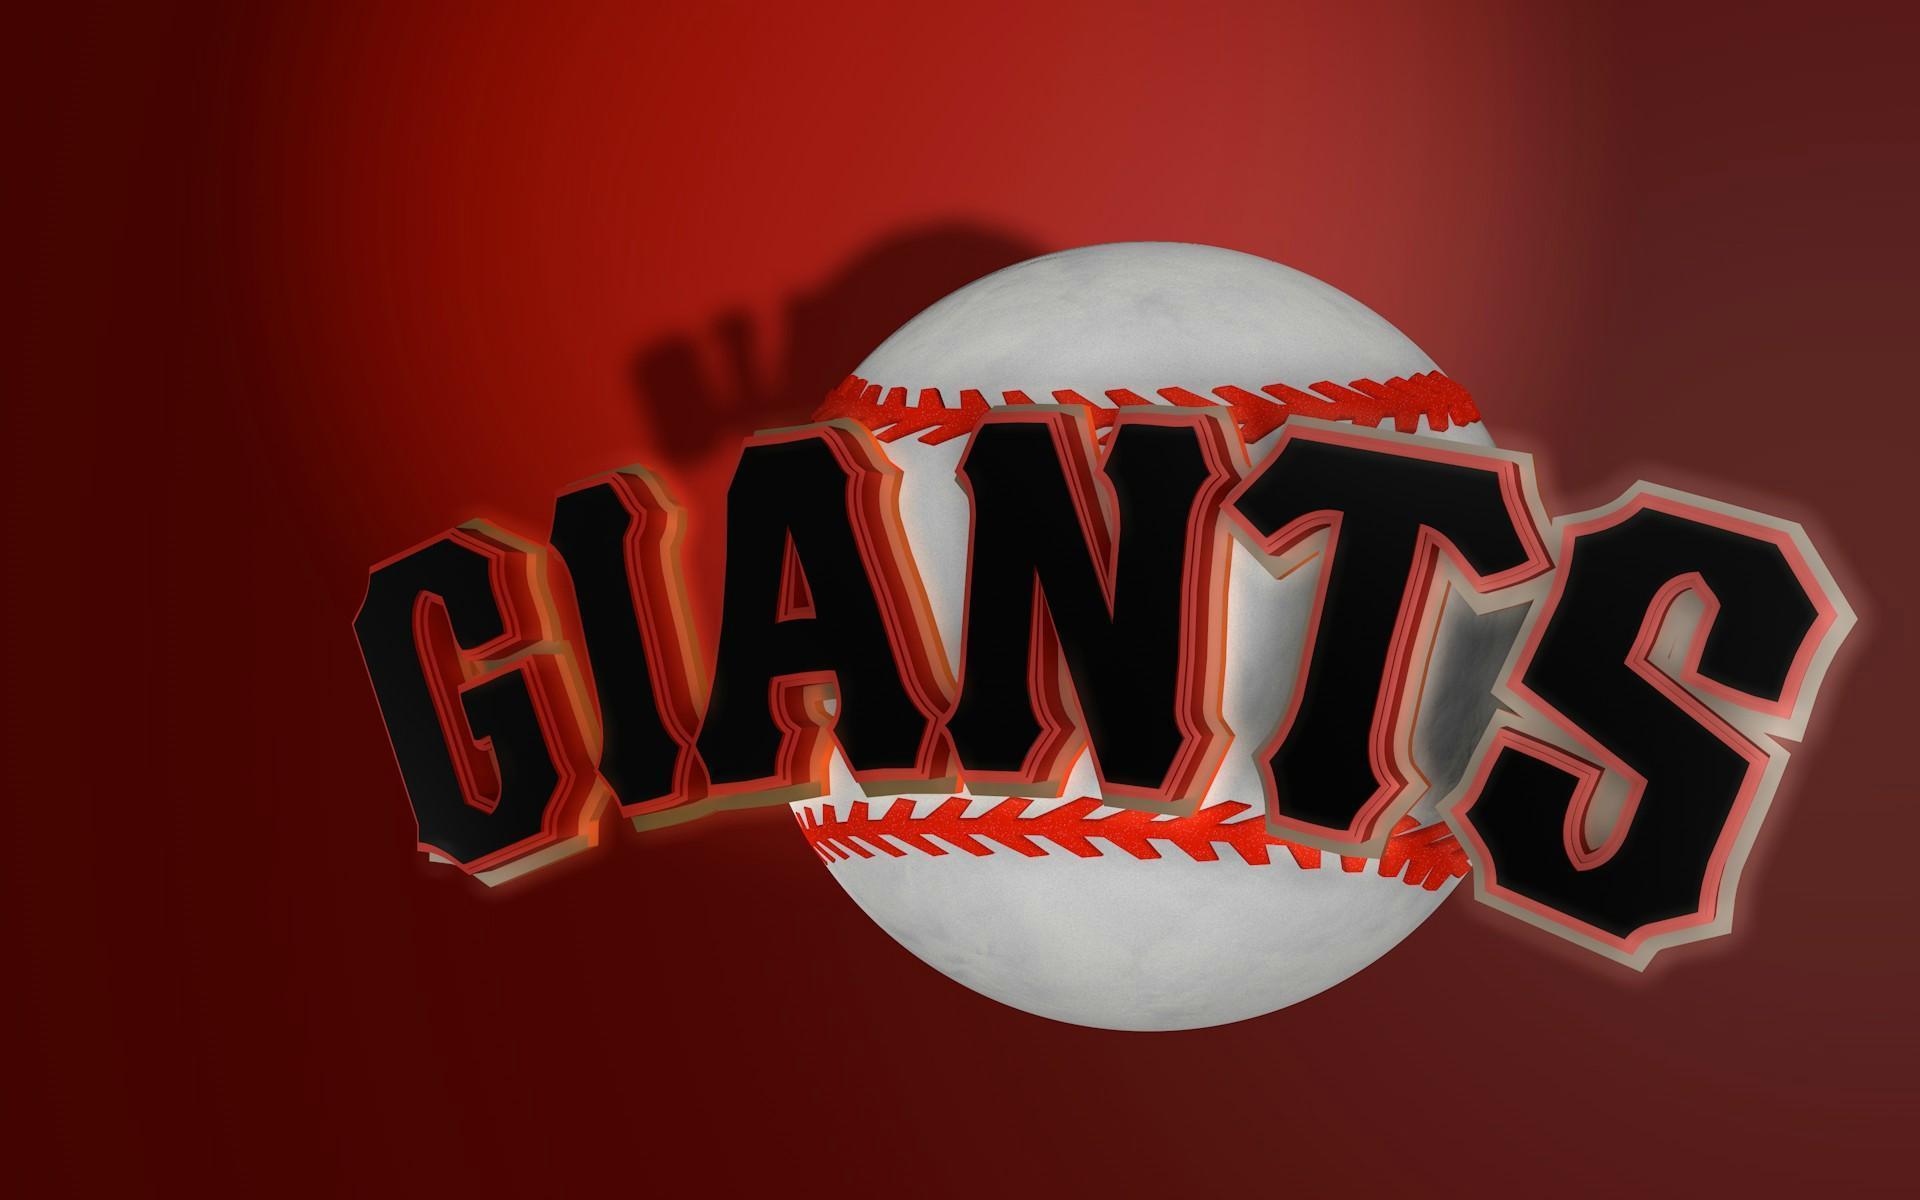 San Francisco Giants Logo Wallpapers Wallpaper Cave HD Wallpapers Download Free Images Wallpaper [1000image.com]